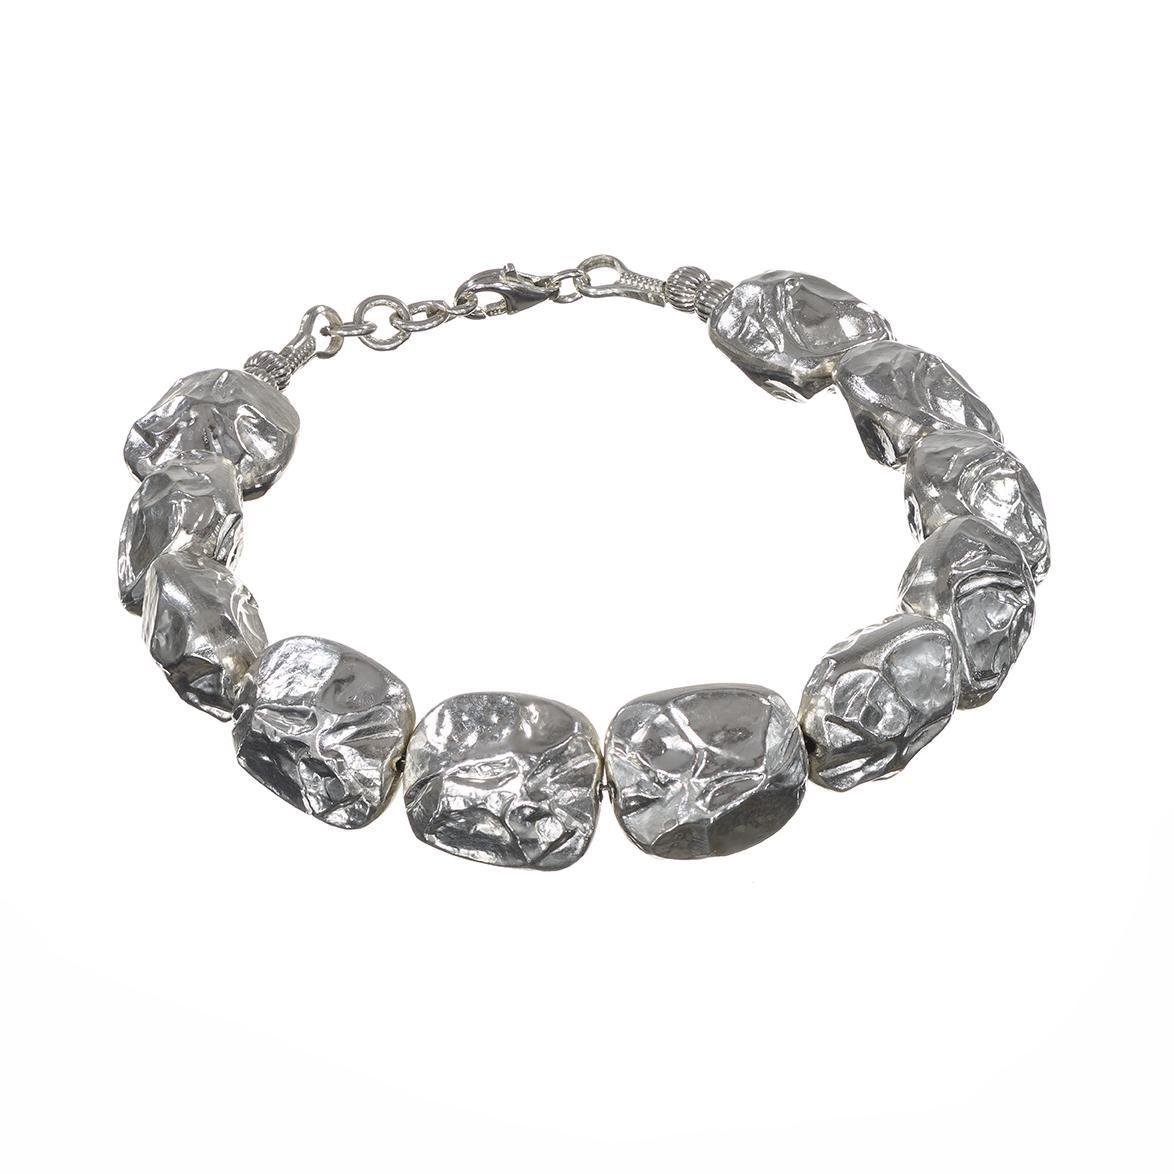 Sterling Silver Flat Beads Bracelet